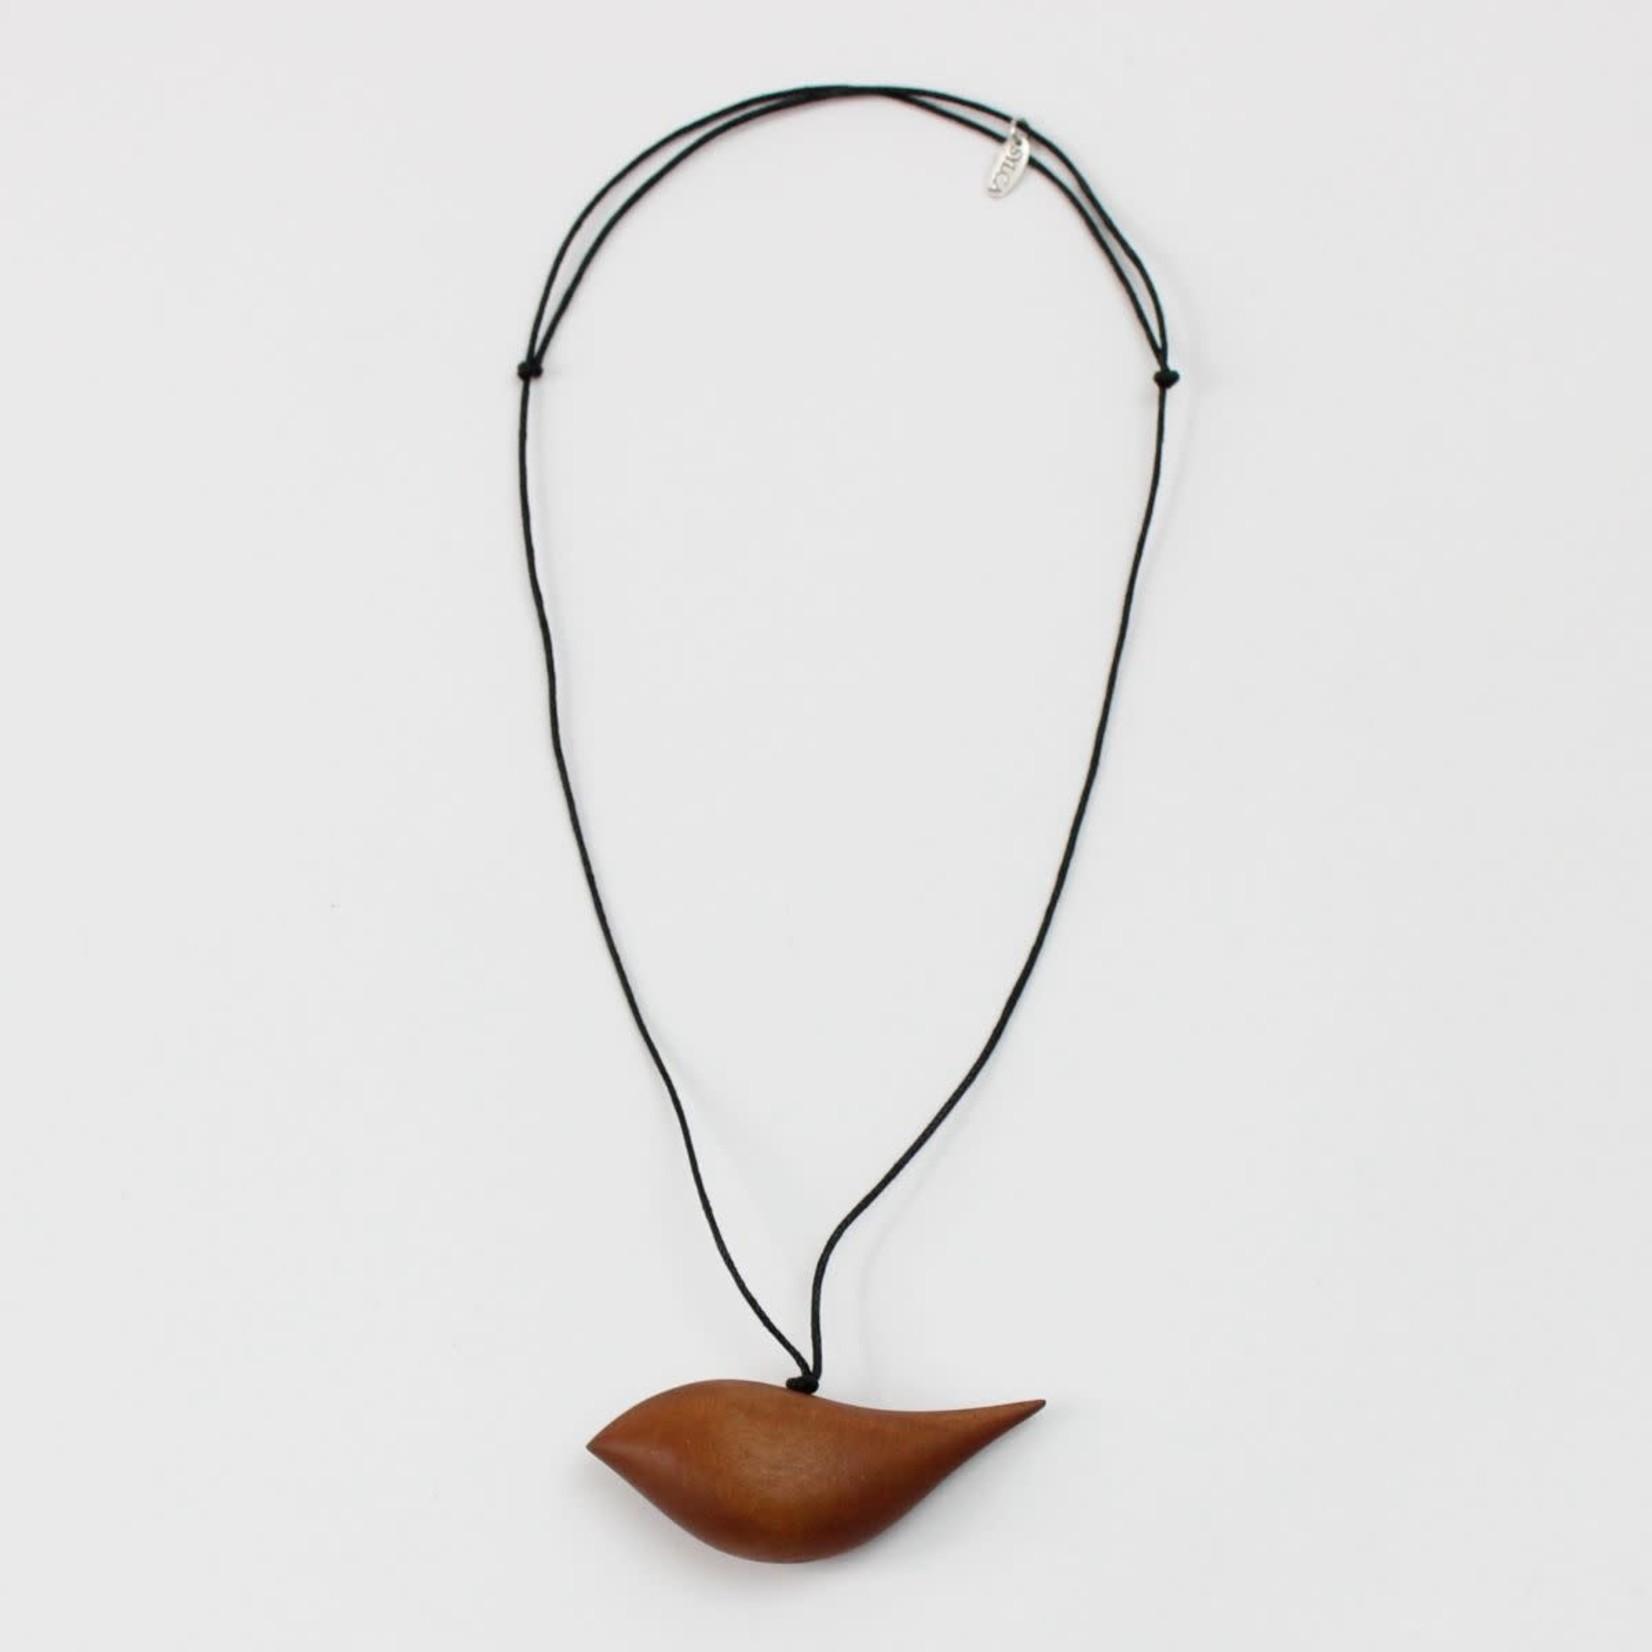 Rust Wood Bird Necklace On Adjustable Cord